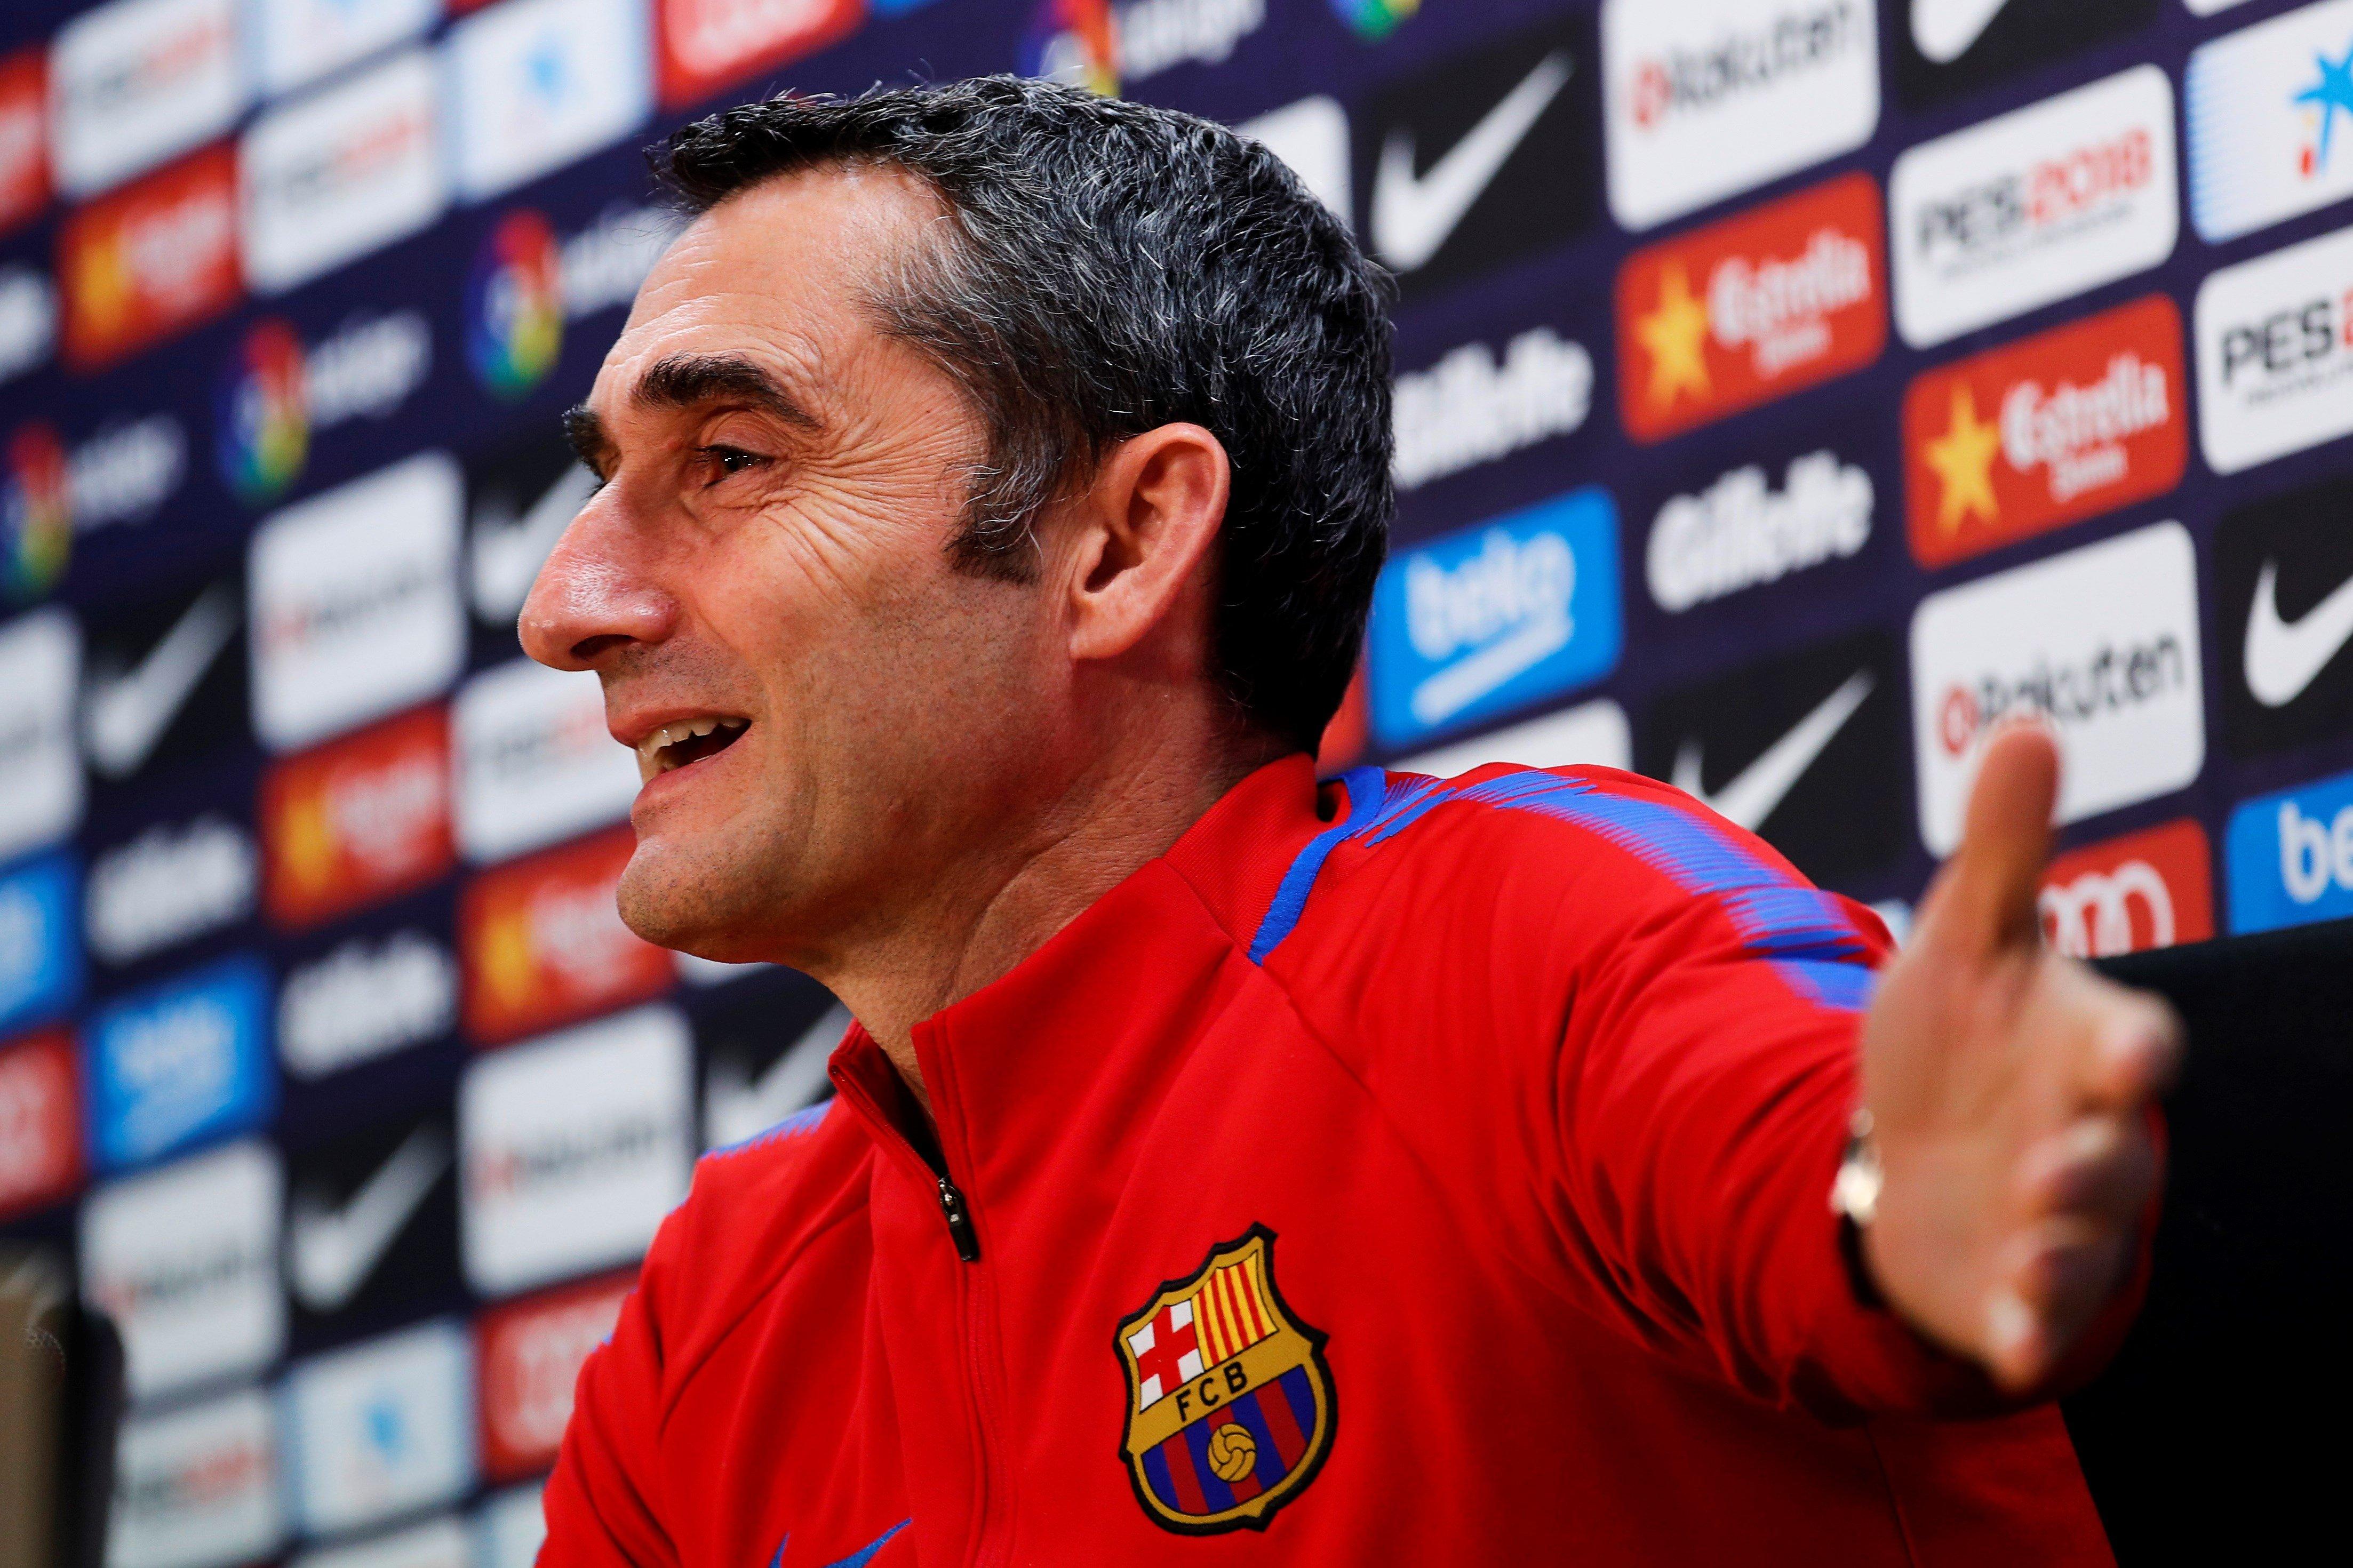 Valverde da descanso a 'pesos pesados' de cara a la final de Copa